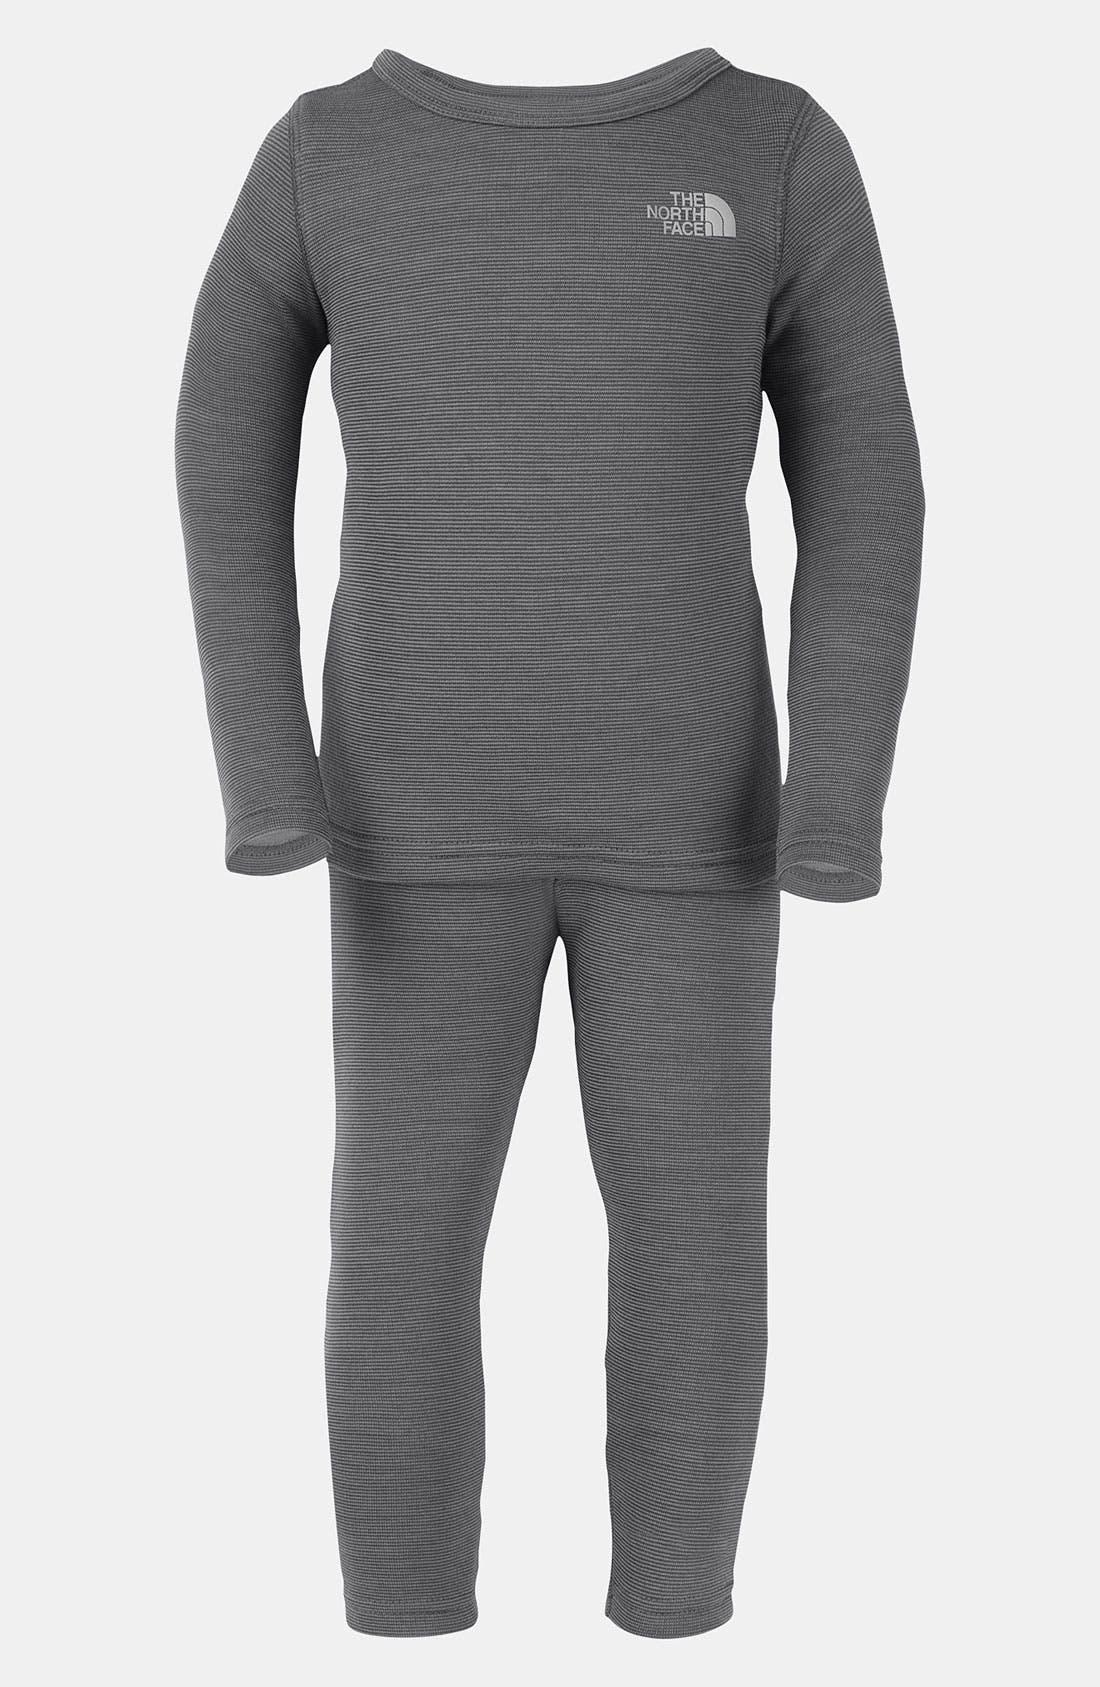 Alternate Image 1 Selected - The North Face 'Baselayer' Shirt & Leggings (Toddler)